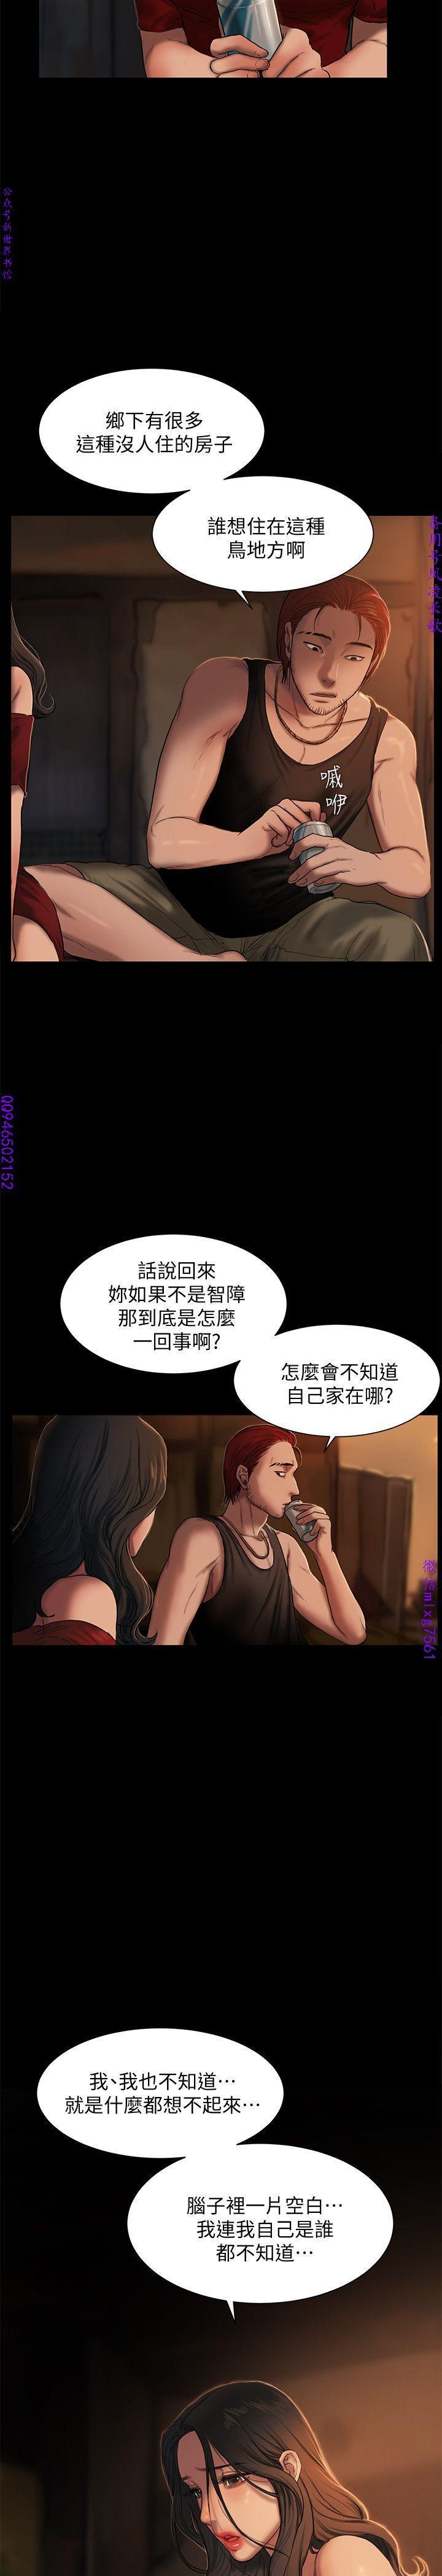 Run away 1-10【中文】 22